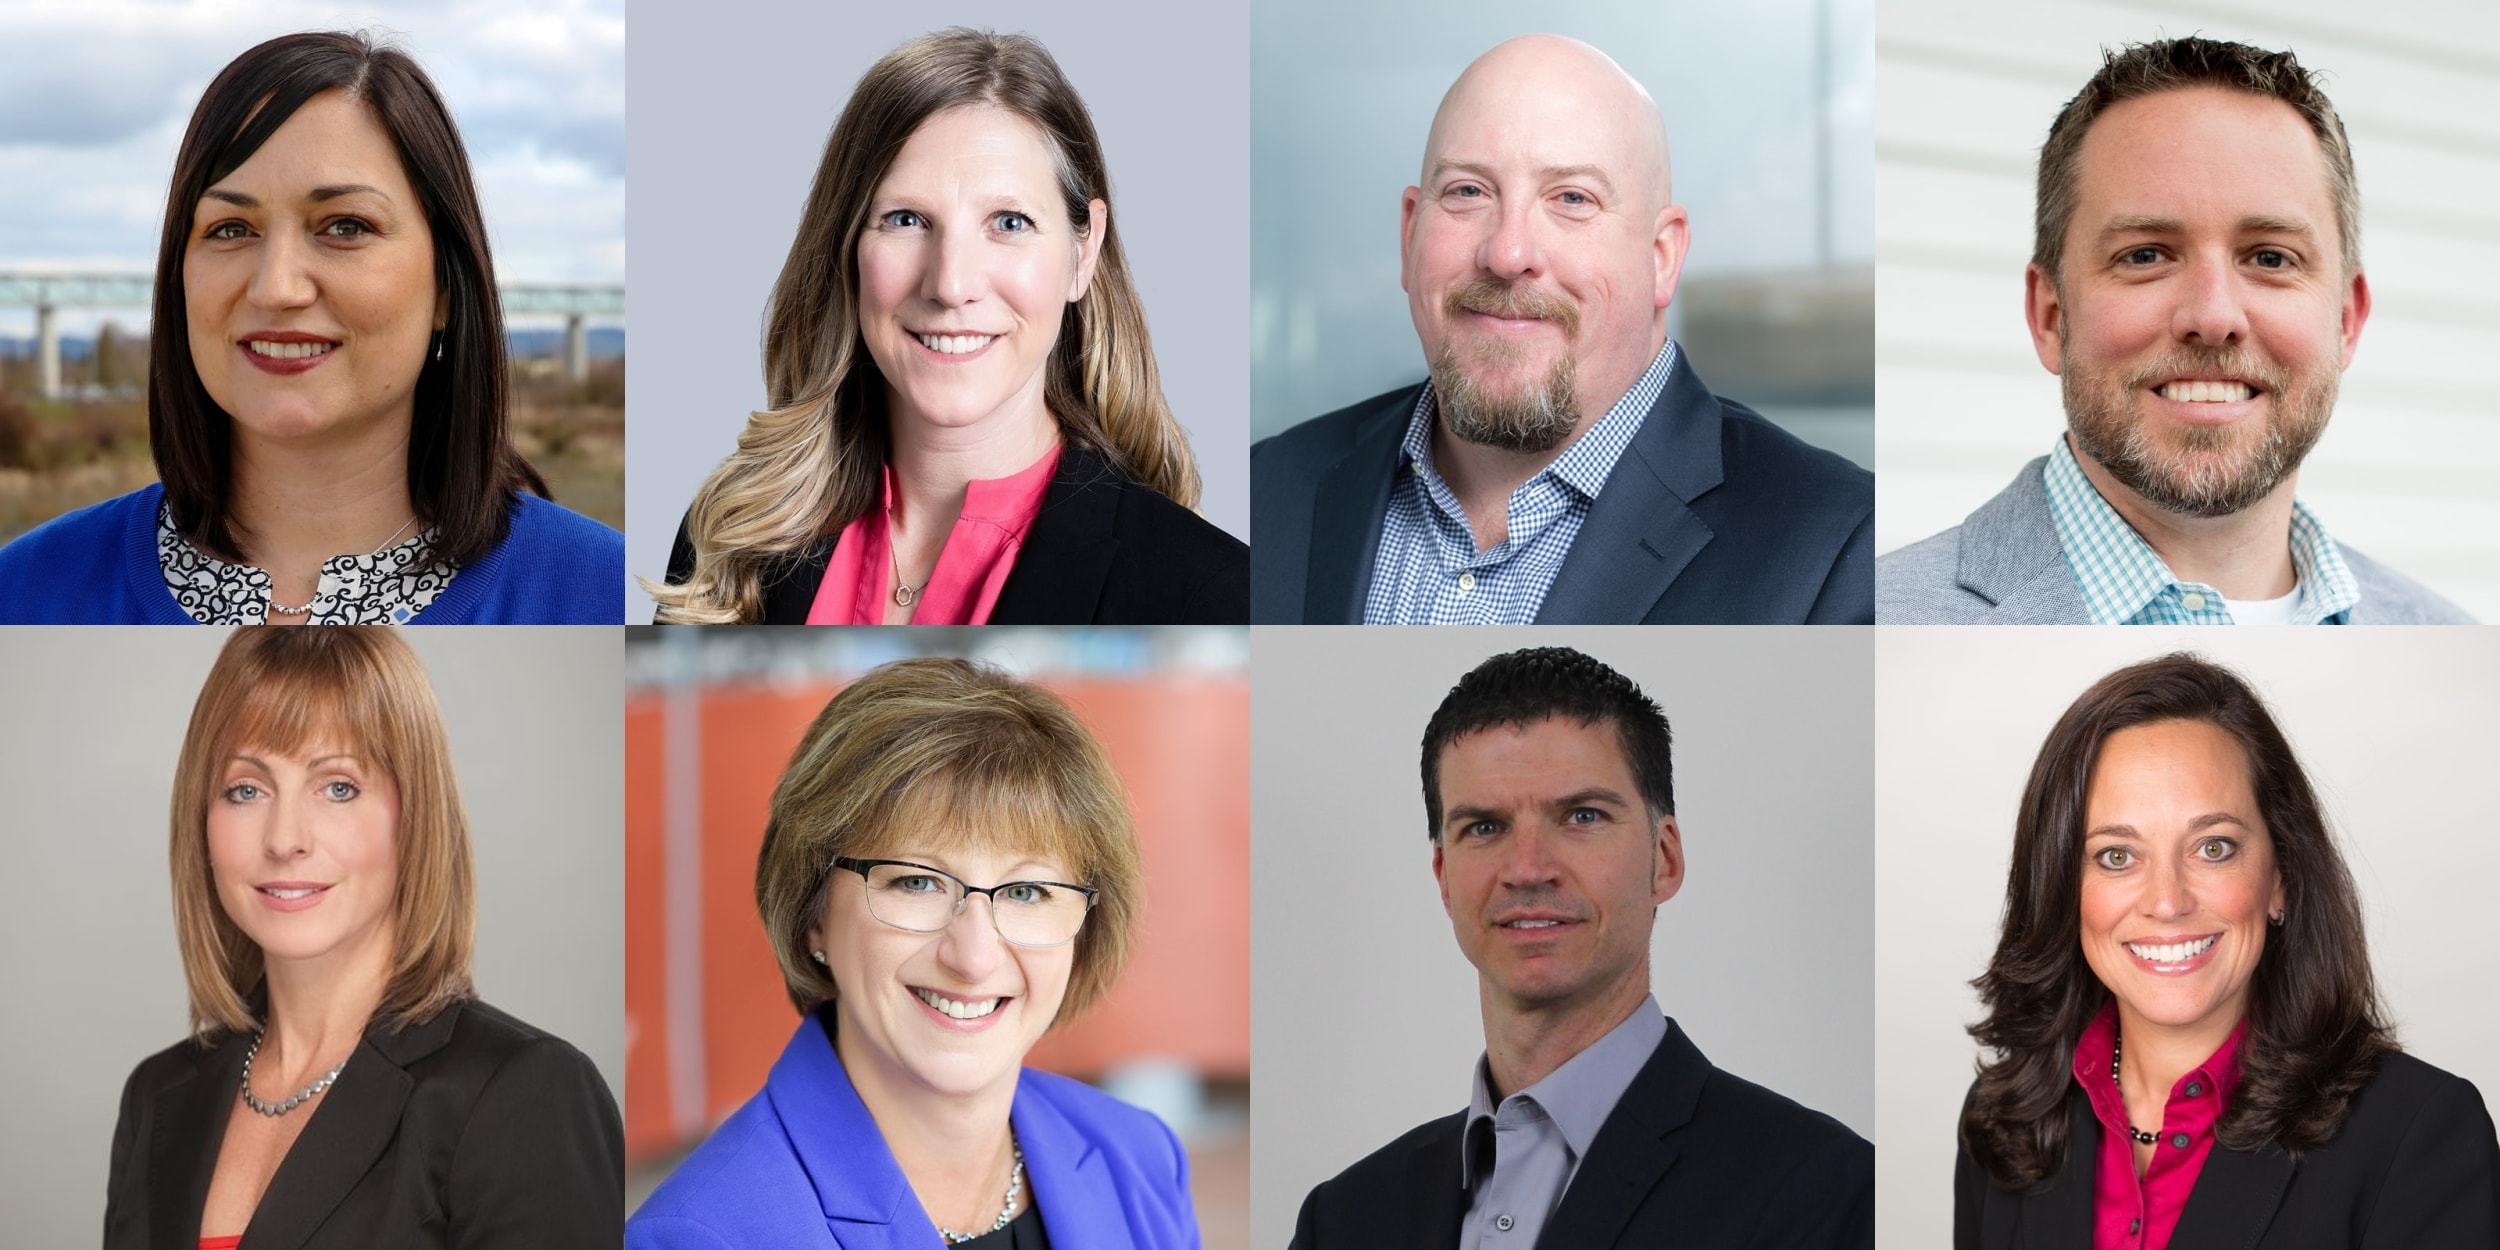 Program Advisors Co-Created with Sustainability Leaders